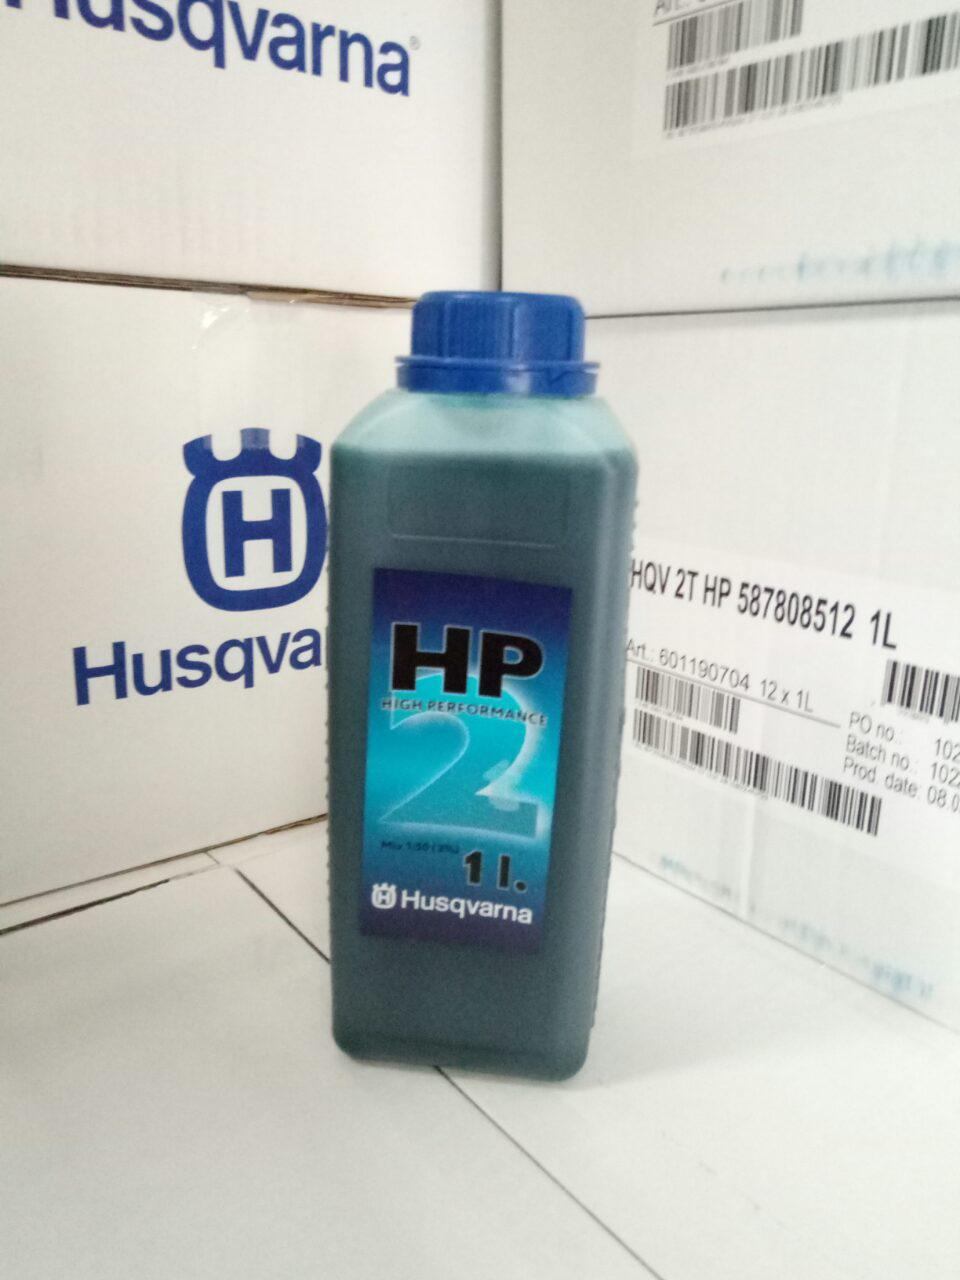 2-тактное масло Husqvarna HP на розлив